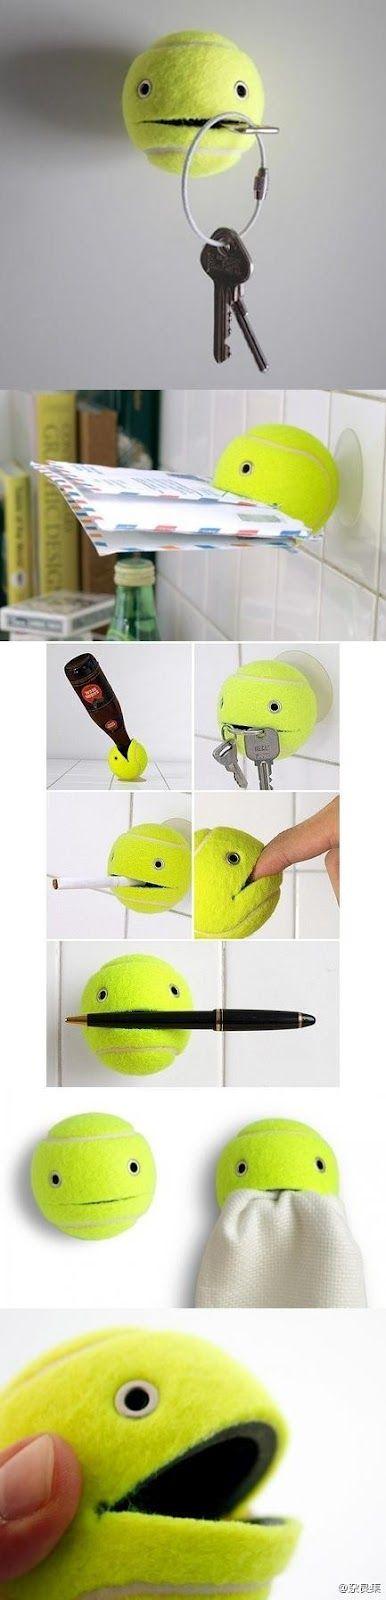 I need some tennis balls